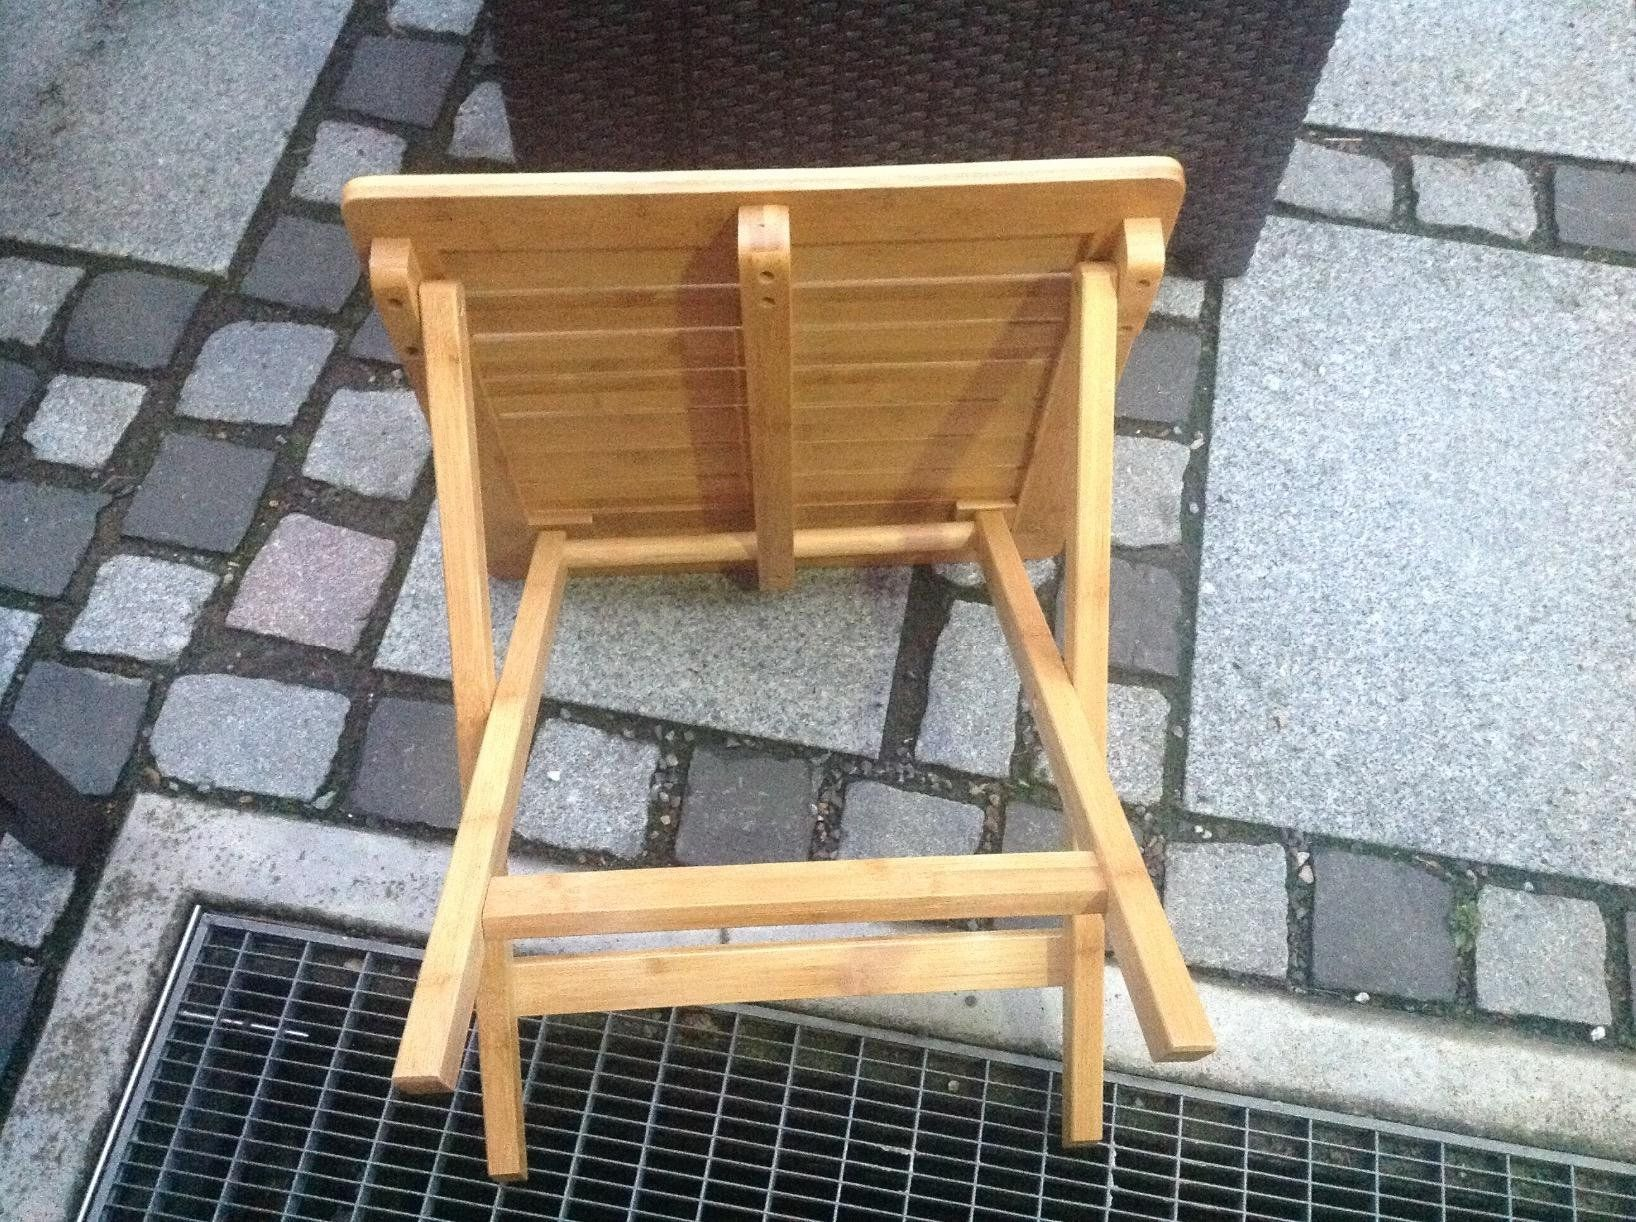 Gartenmobel aus holz bei amazon - Balkonmobel 3er set ...